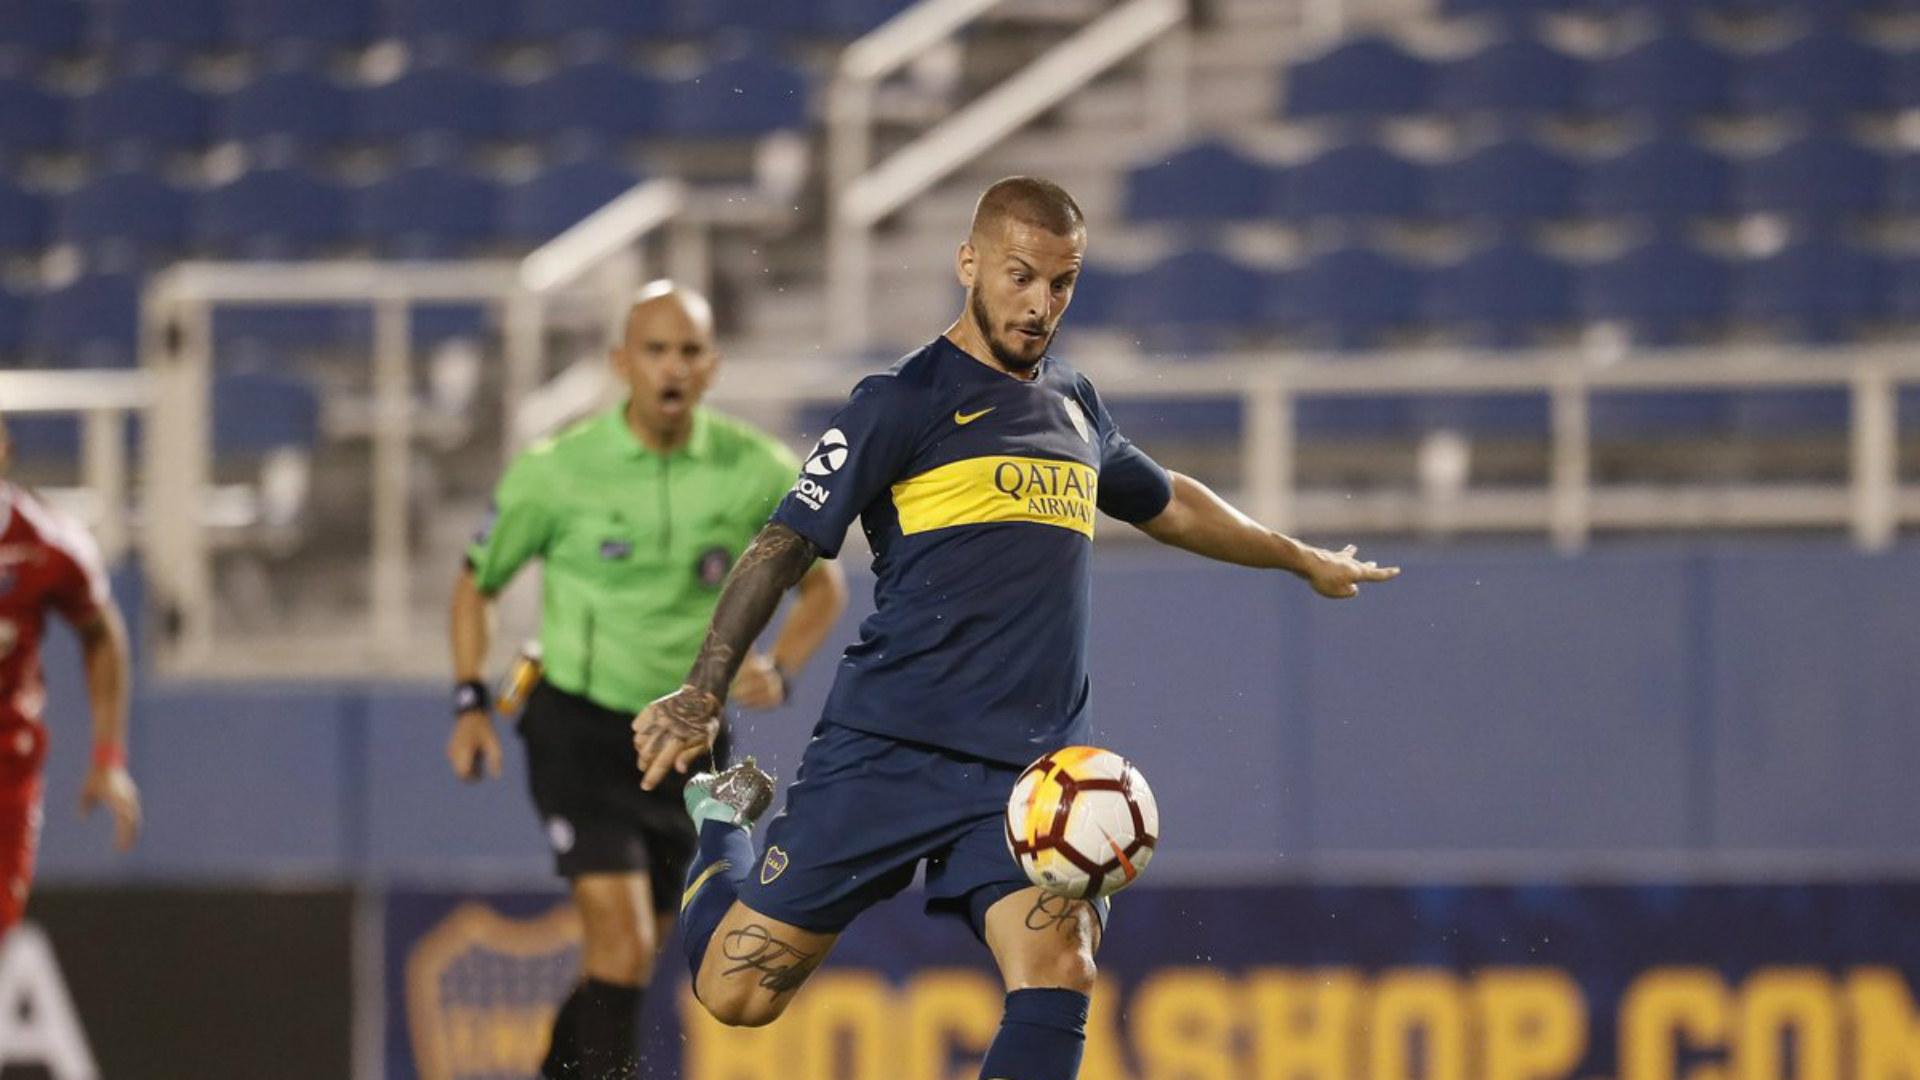 Benedetto Boca Independiente Medellin Amistoso Pretemporada 2018